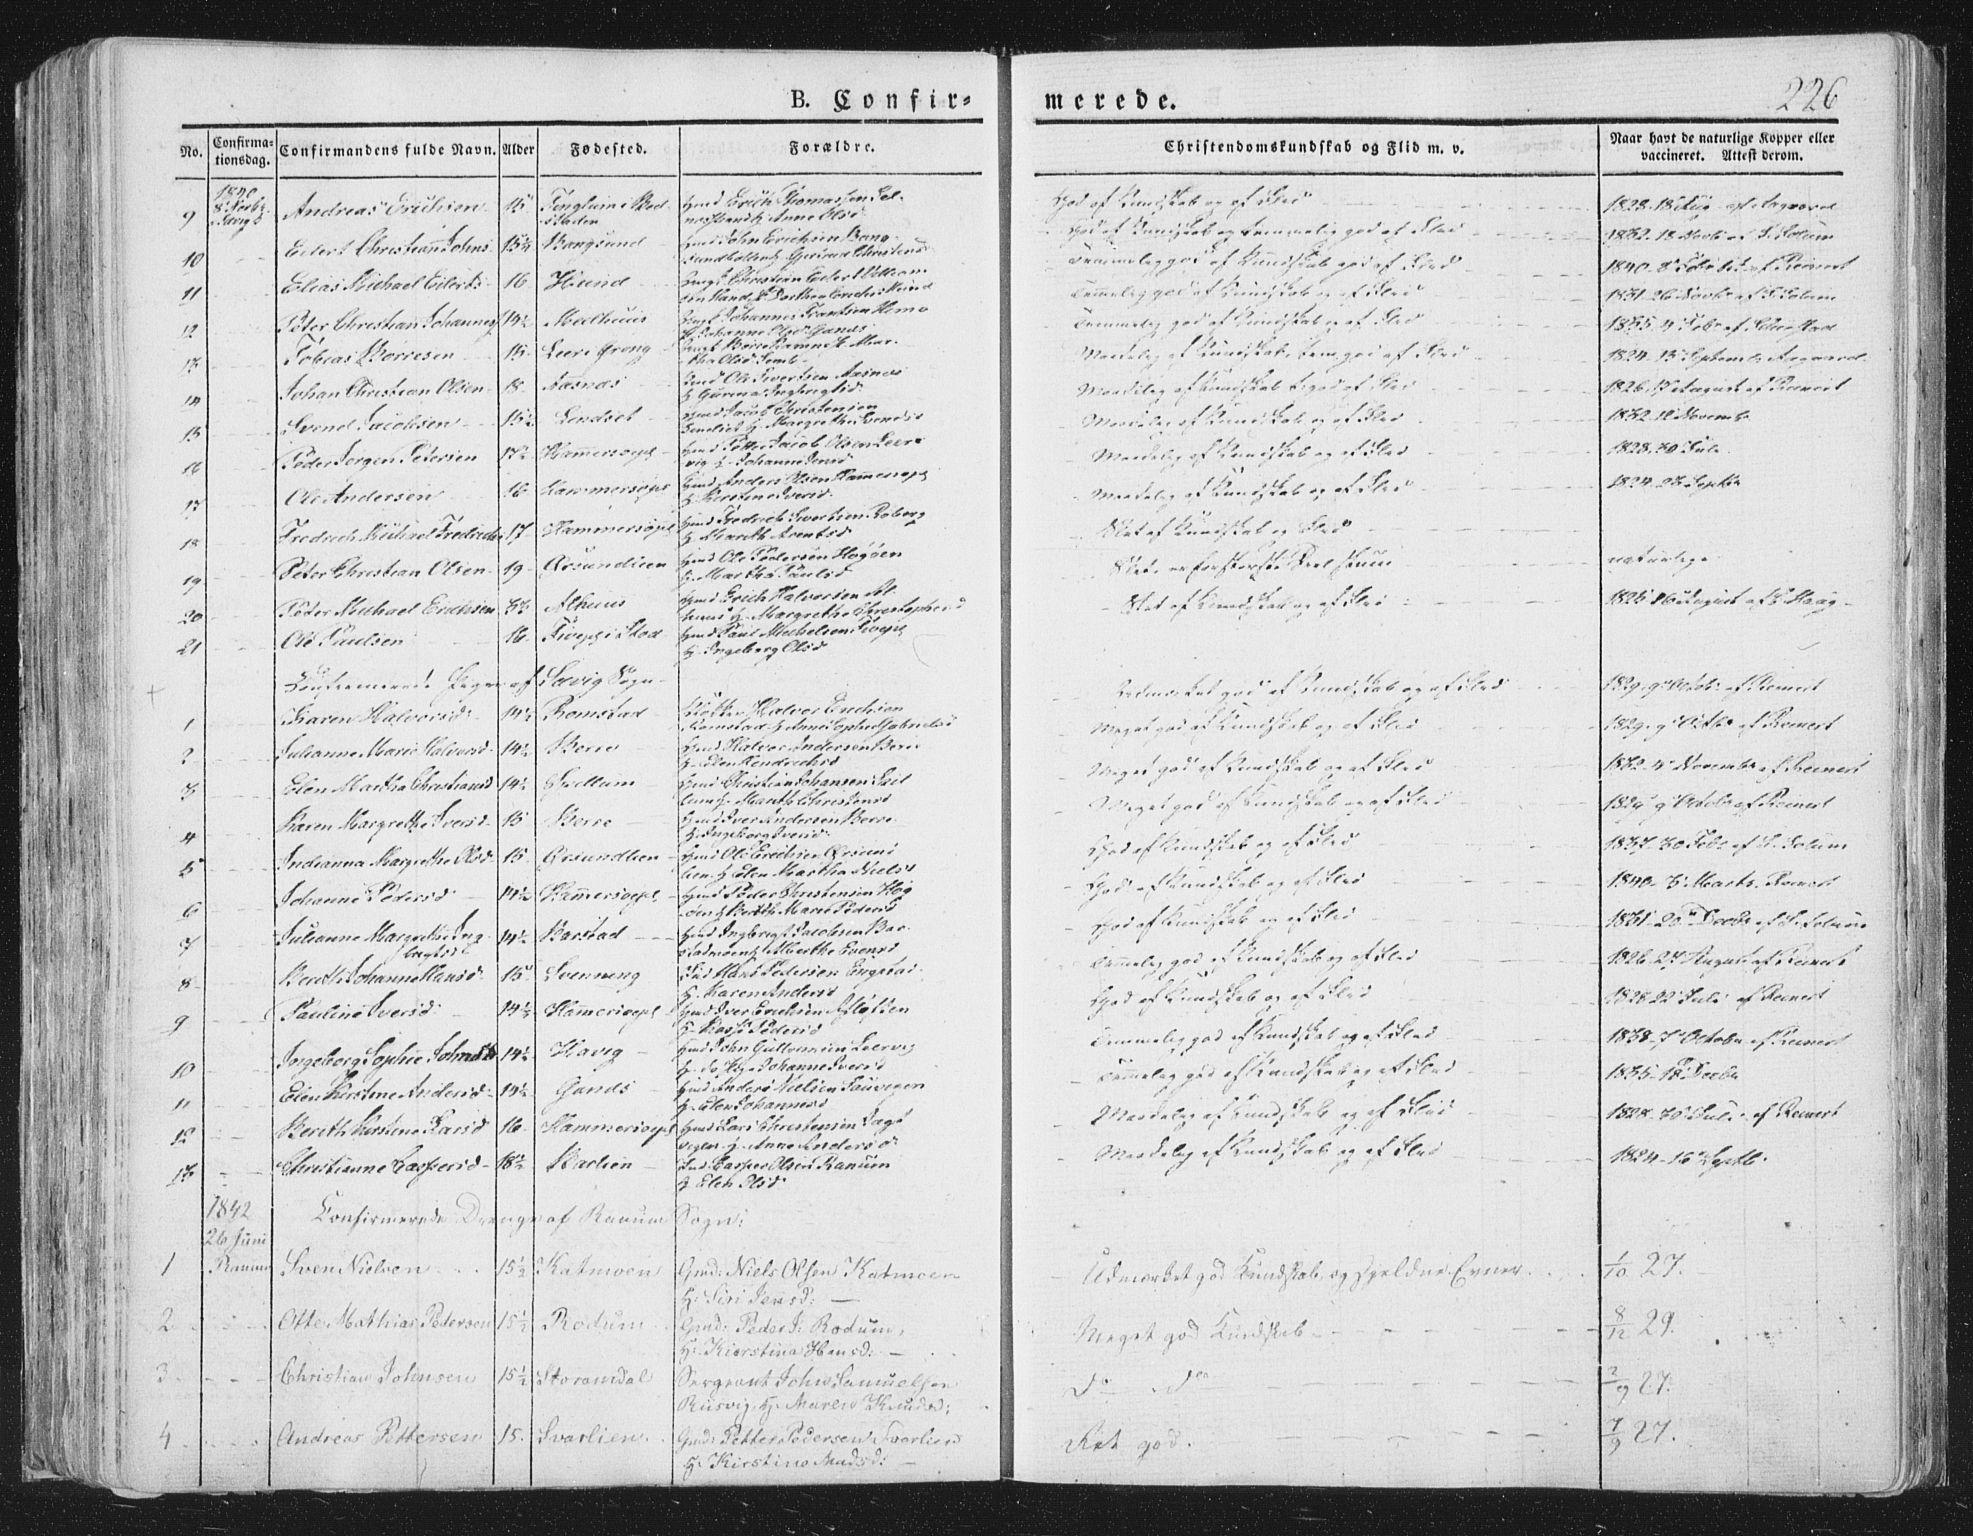 SAT, Ministerialprotokoller, klokkerbøker og fødselsregistre - Nord-Trøndelag, 764/L0551: Ministerialbok nr. 764A07a, 1824-1864, s. 226